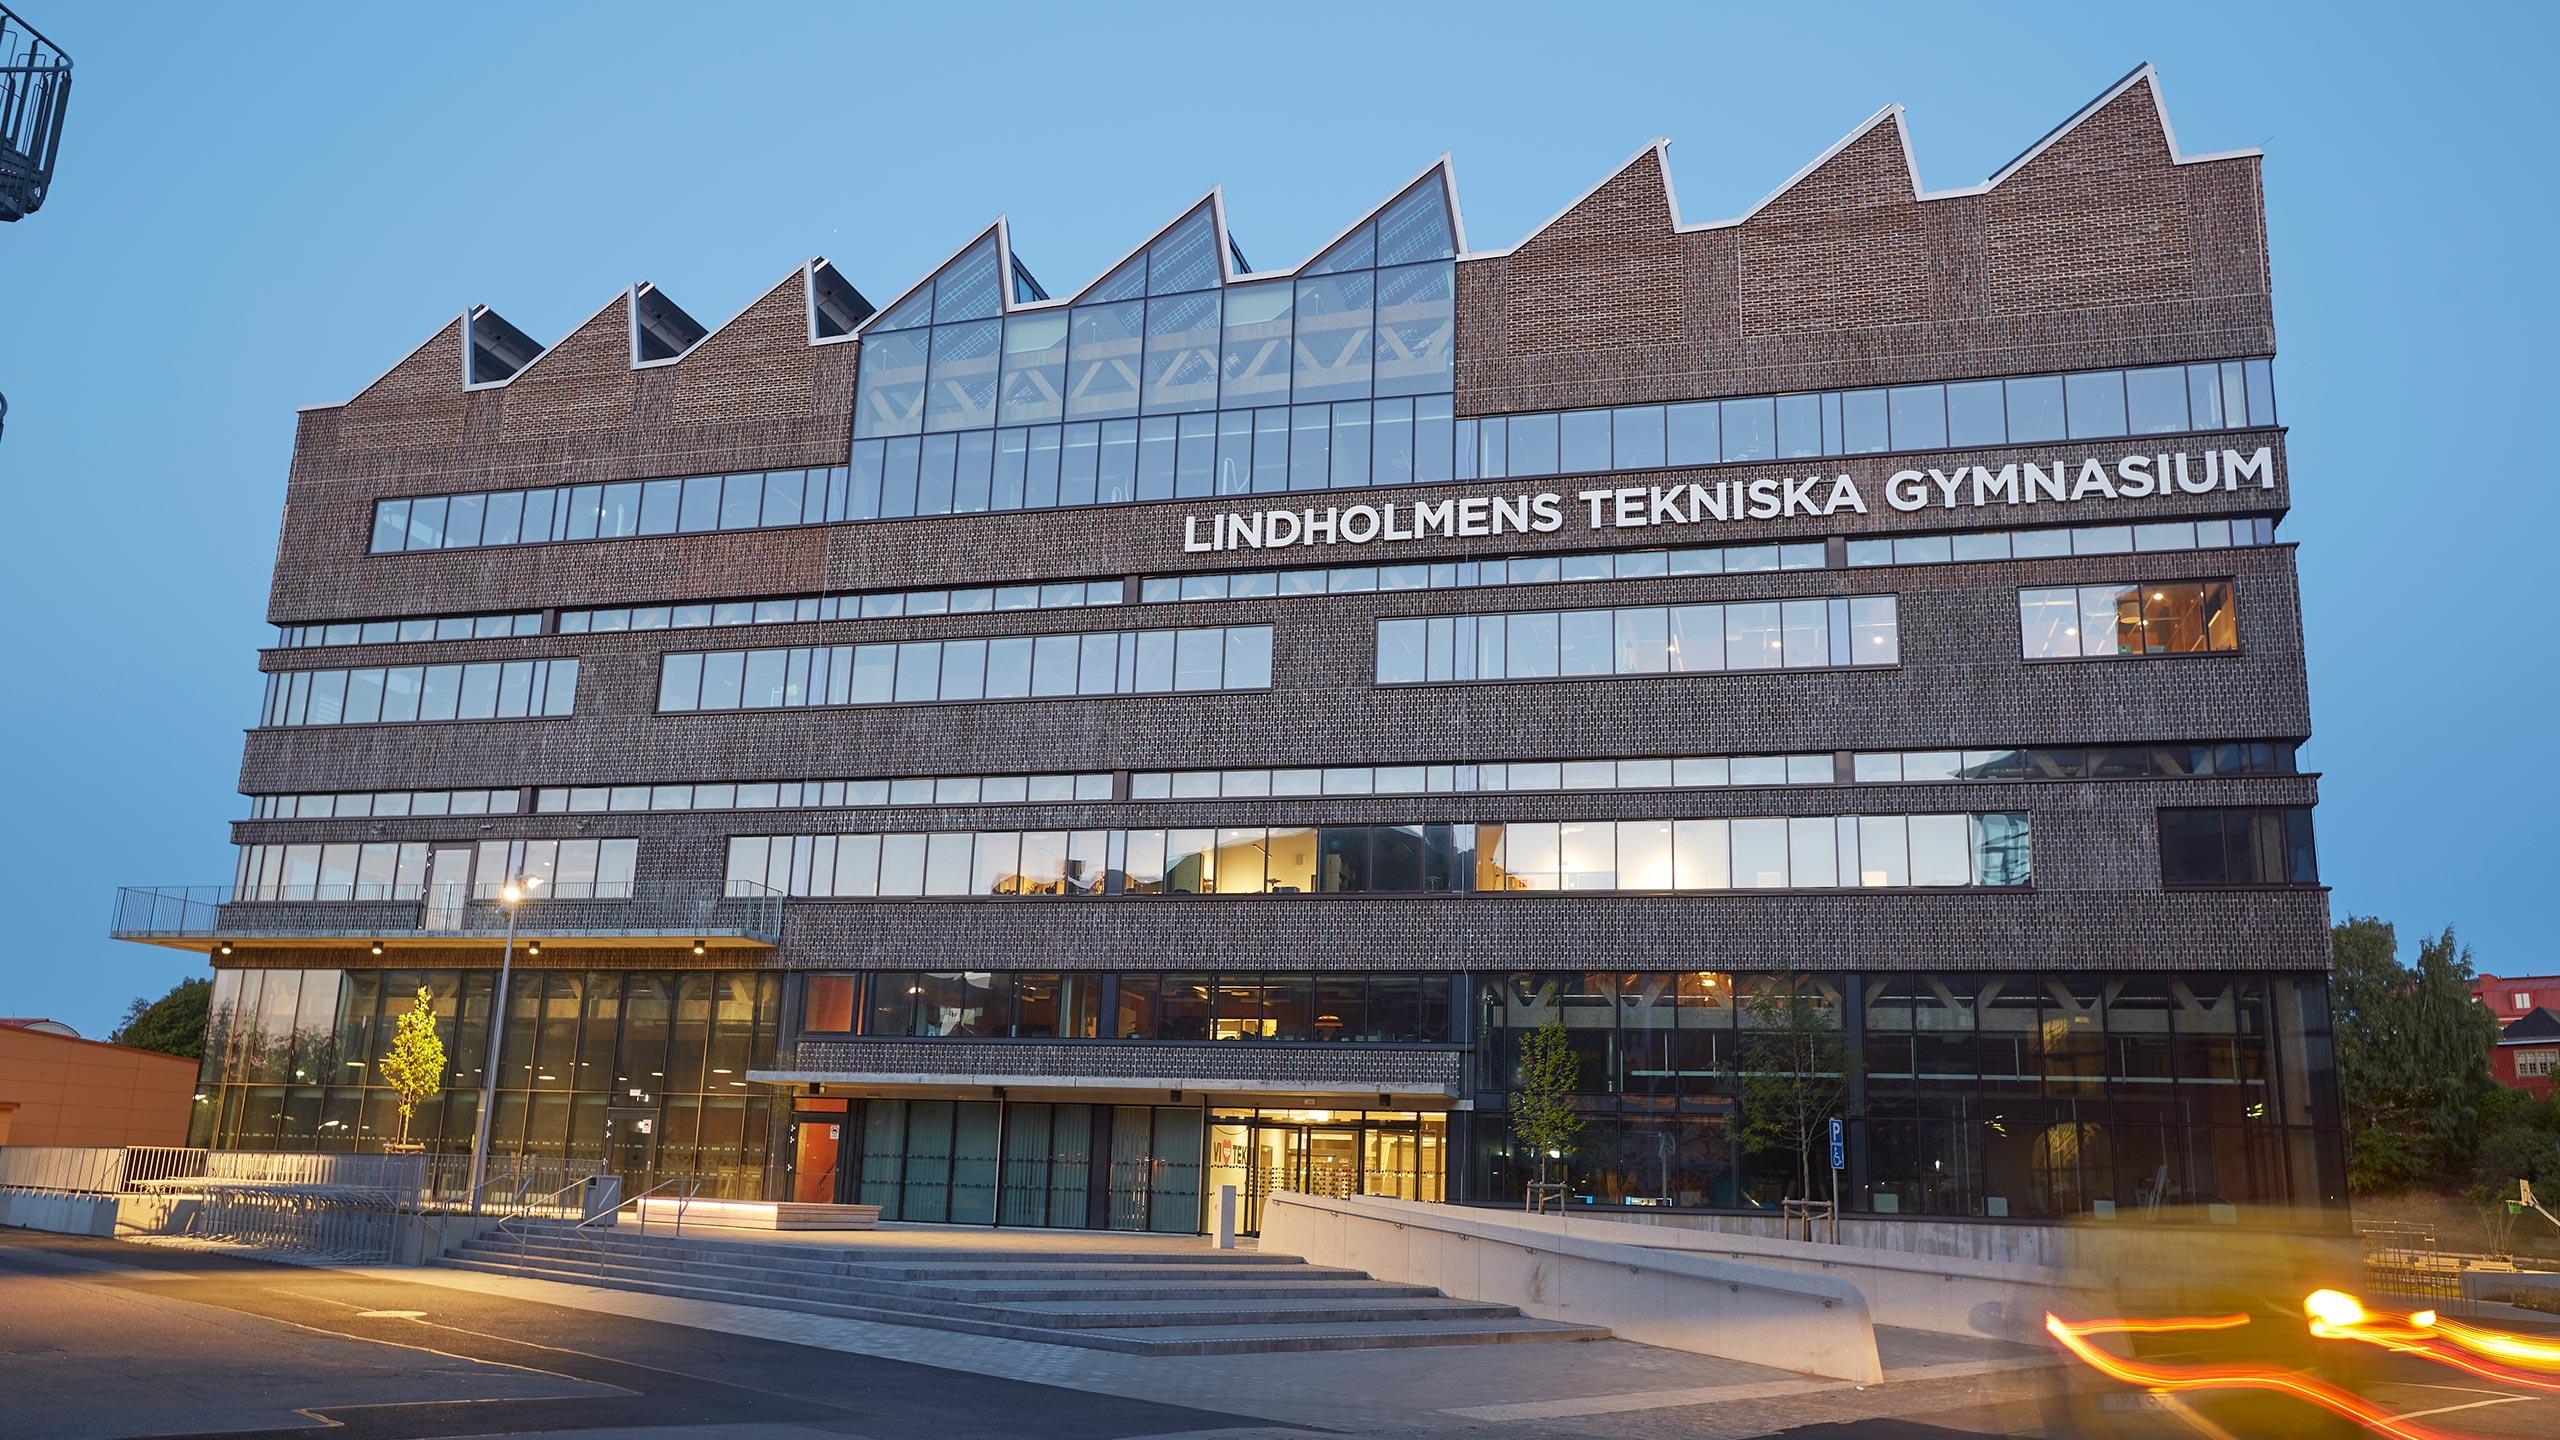 Lindholmens Tekniska Gymnasium